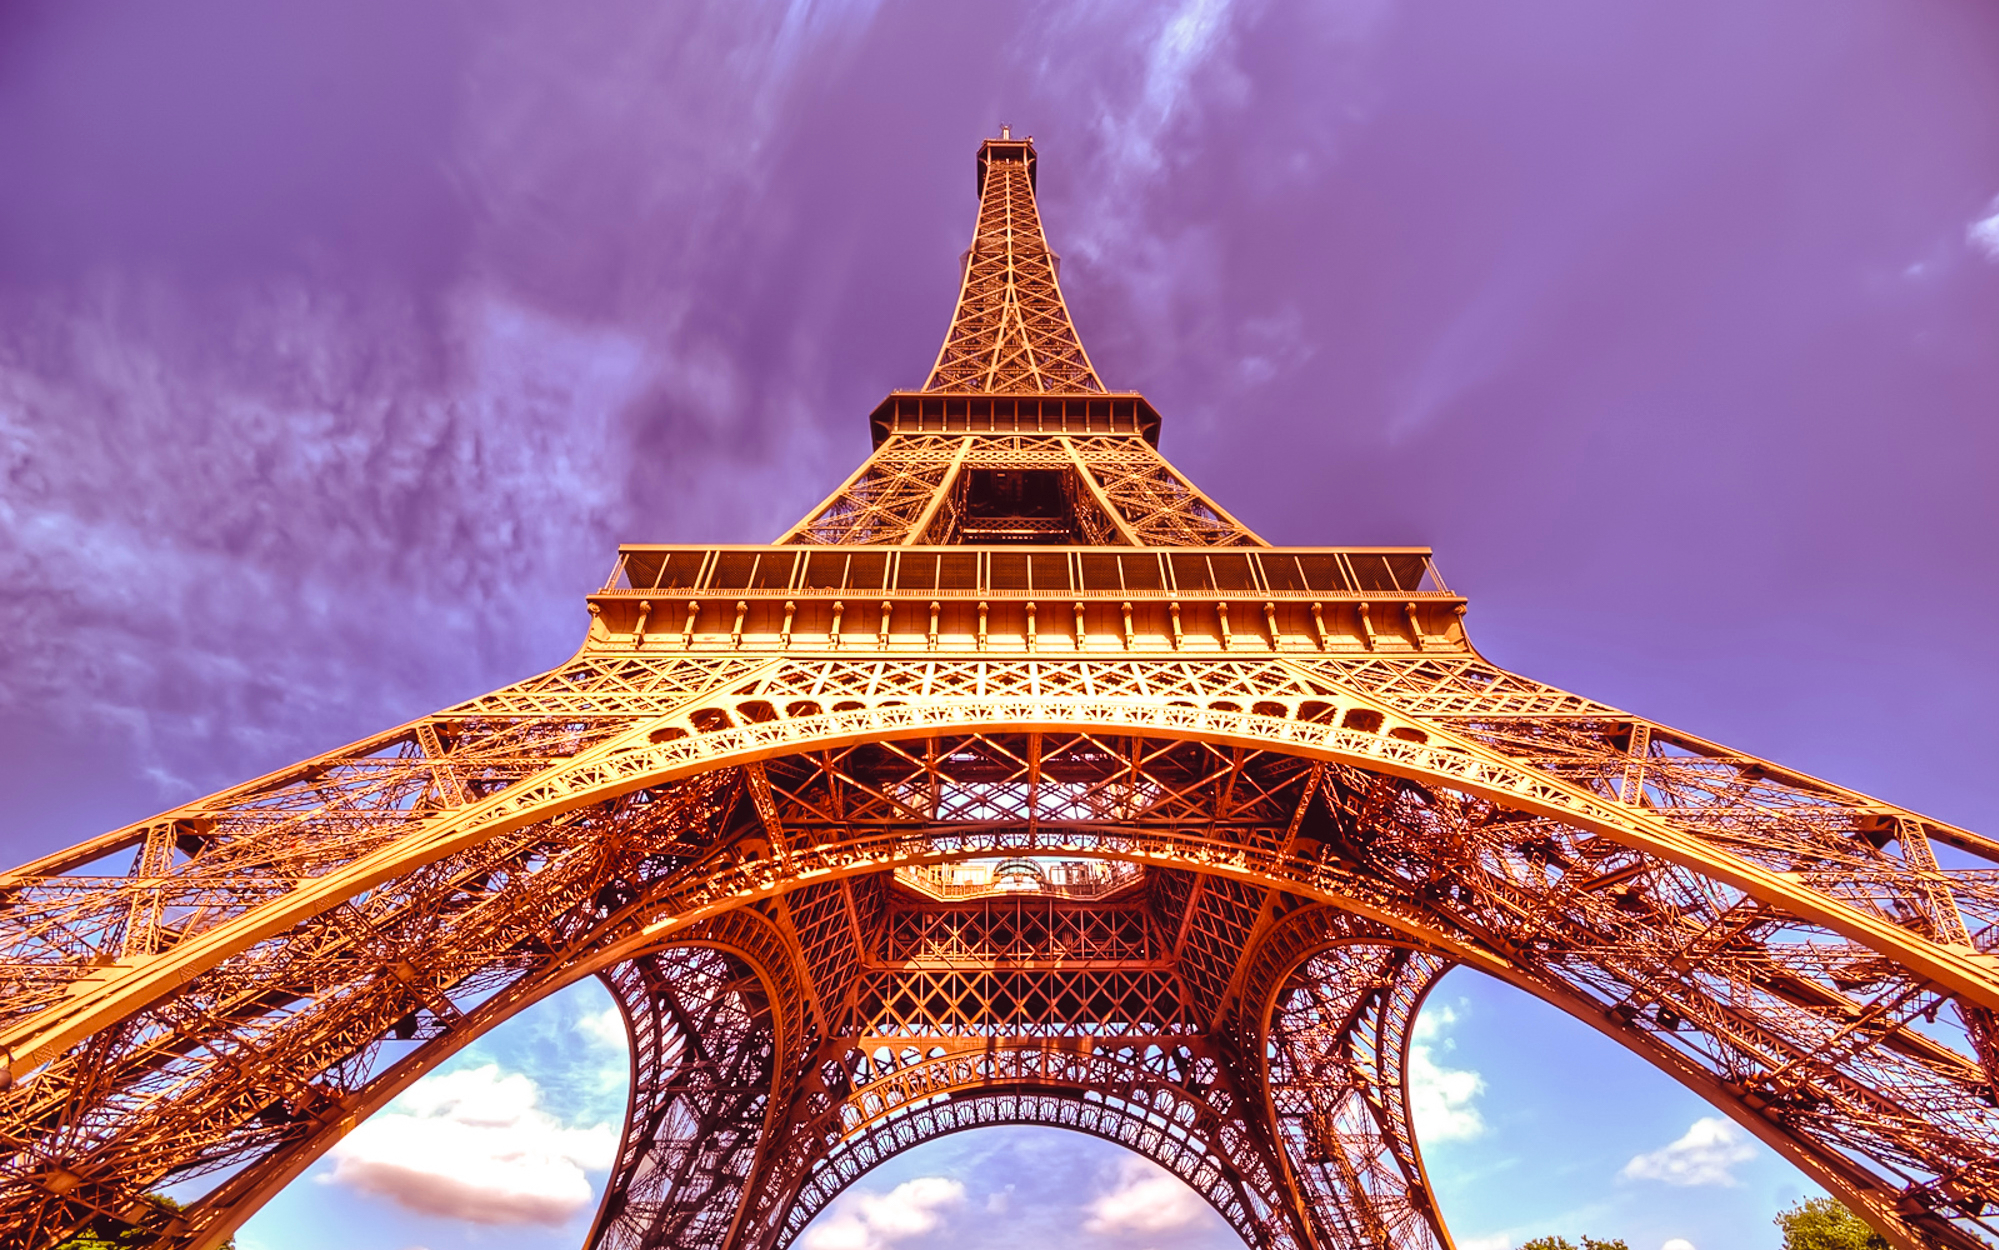 Best s Paris Eiffel Tower Wallpaper Paris Eiffel Tower Hd